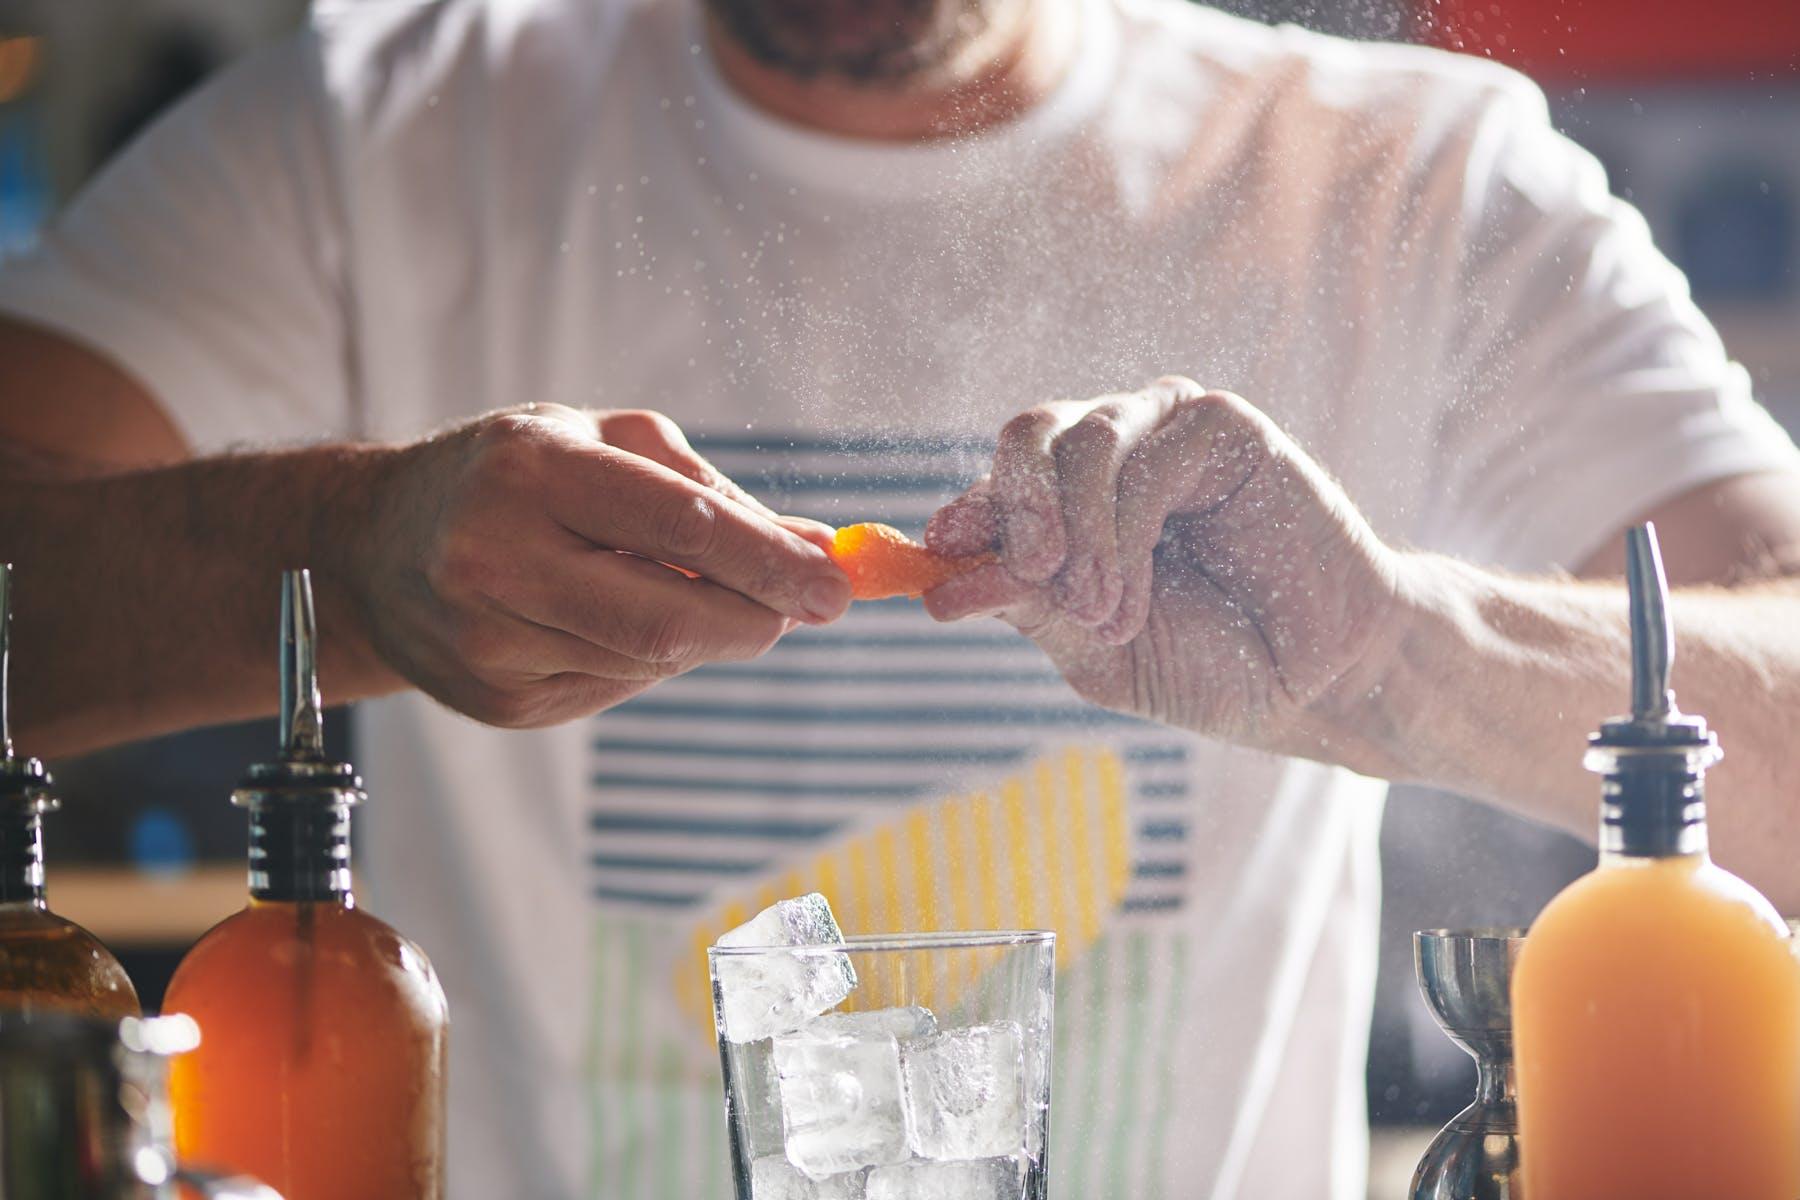 a man holding a glass of orange juice